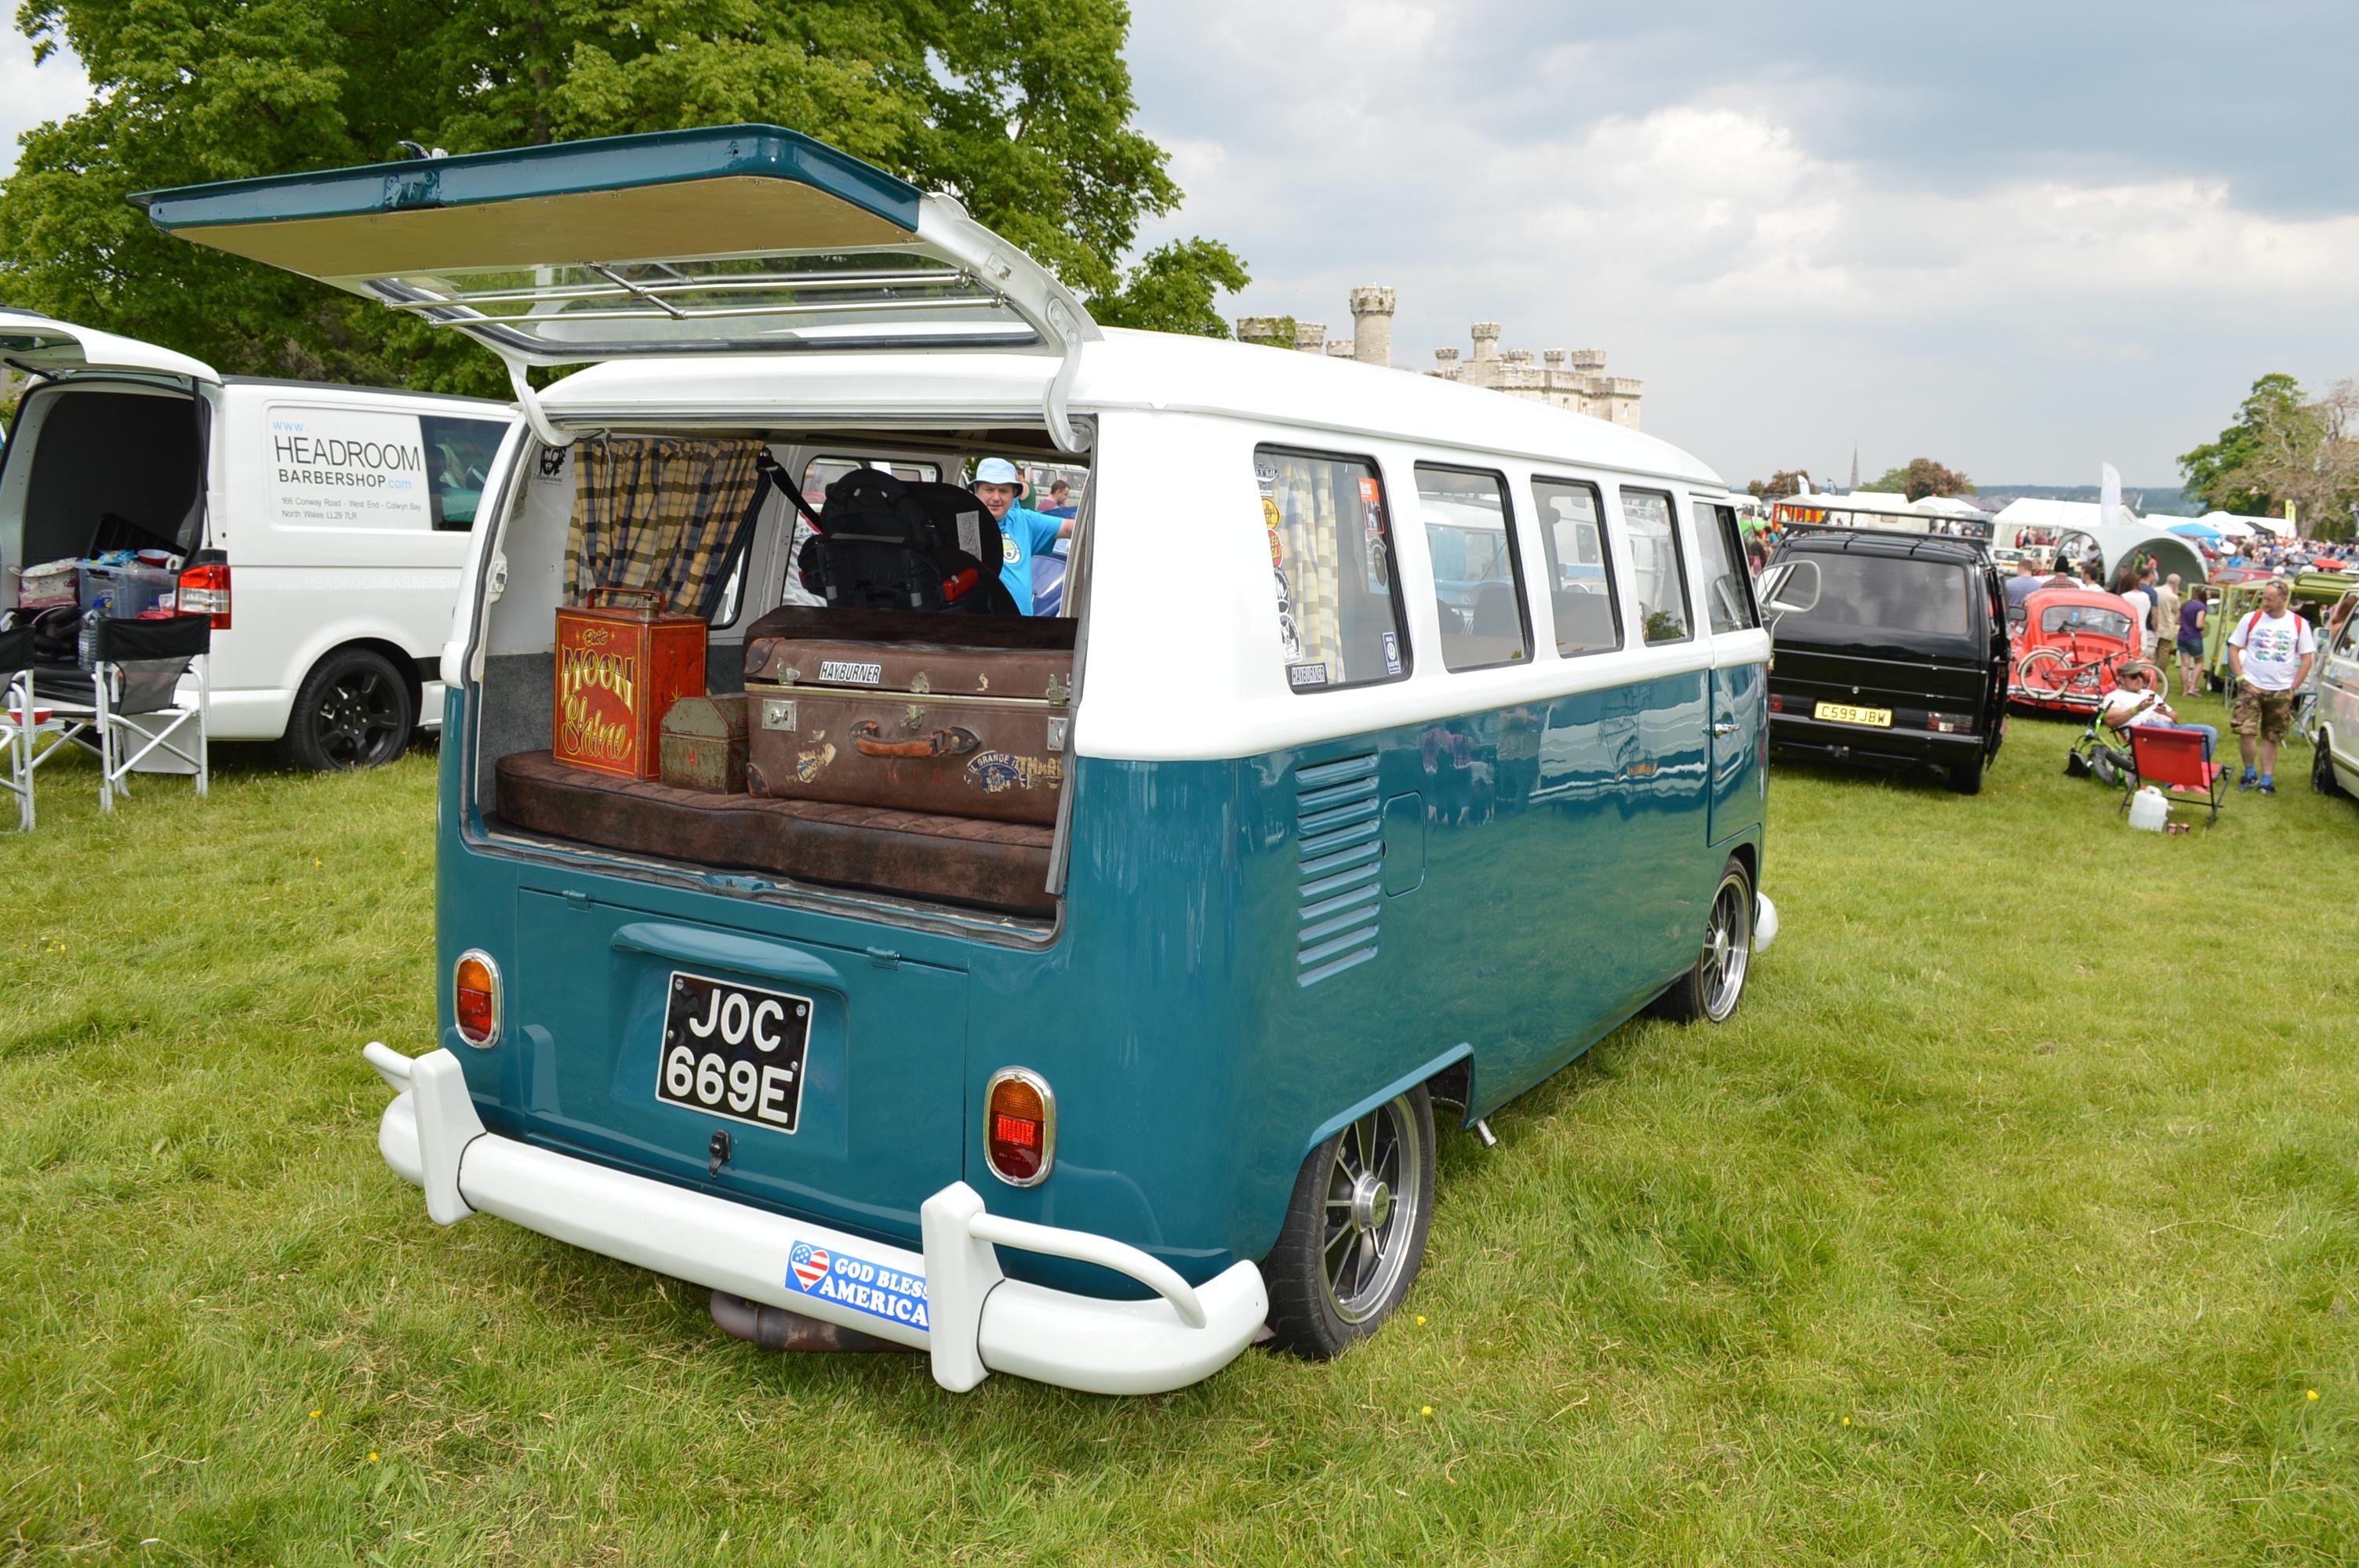 Outdoor Car Adventure Volkswagen Van Summer Vacation Travel Vehicle Journey Holiday Camping Camper Camp